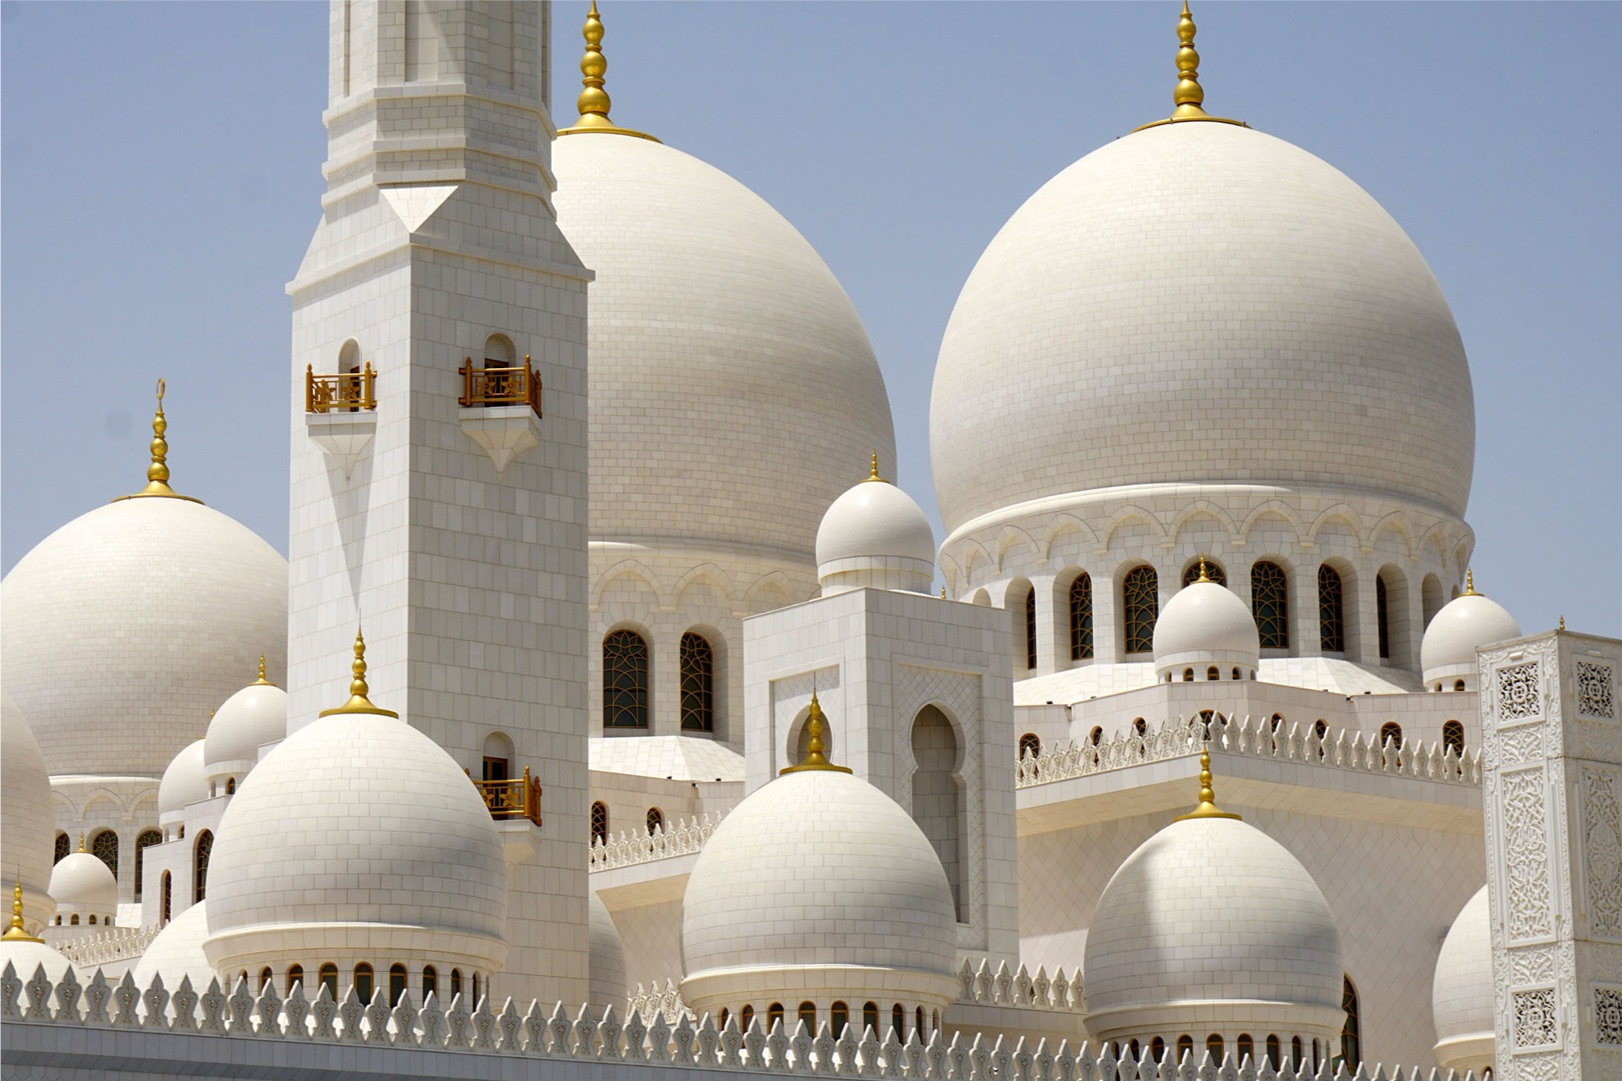 2022年 2/29 杜拜阿聯酋遊輪10天 03/07(六) 阿布扎比Abu Dhabi United Arab Emirates